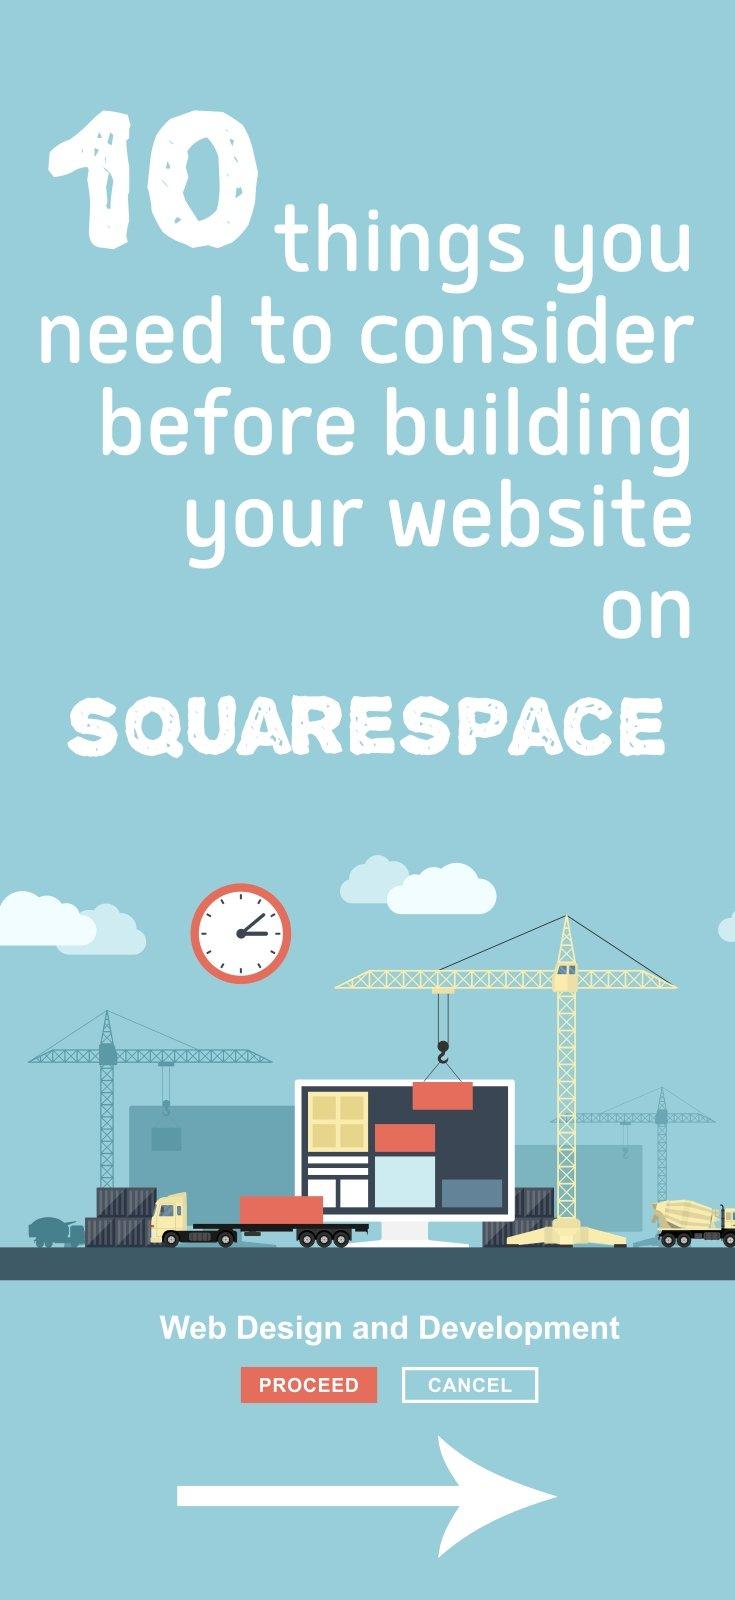 Best Squarespace Alternatives